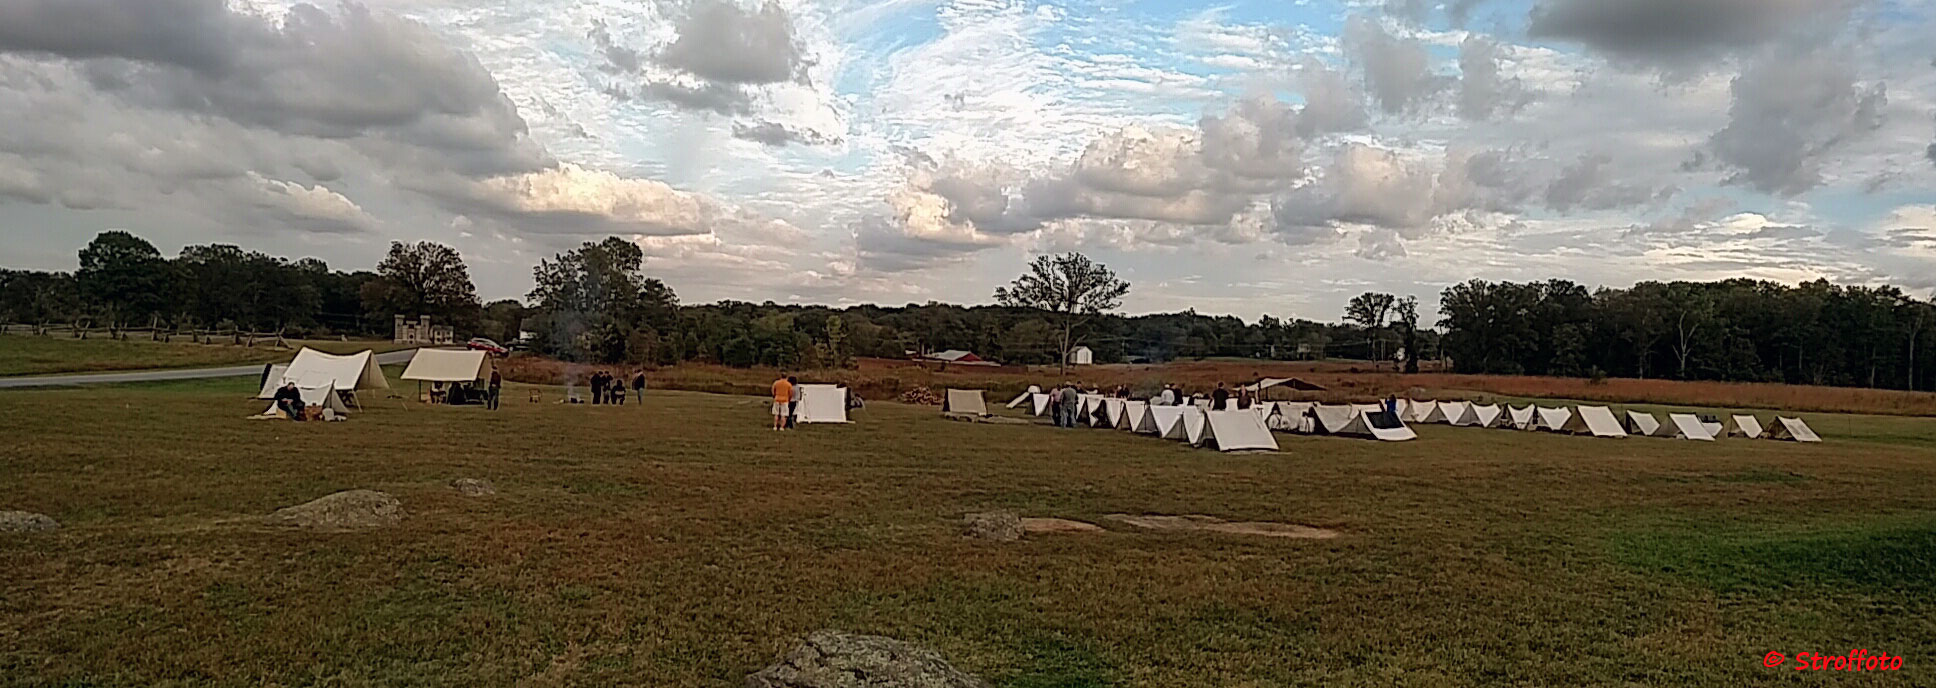 Soldiers at camp in Gettysburg